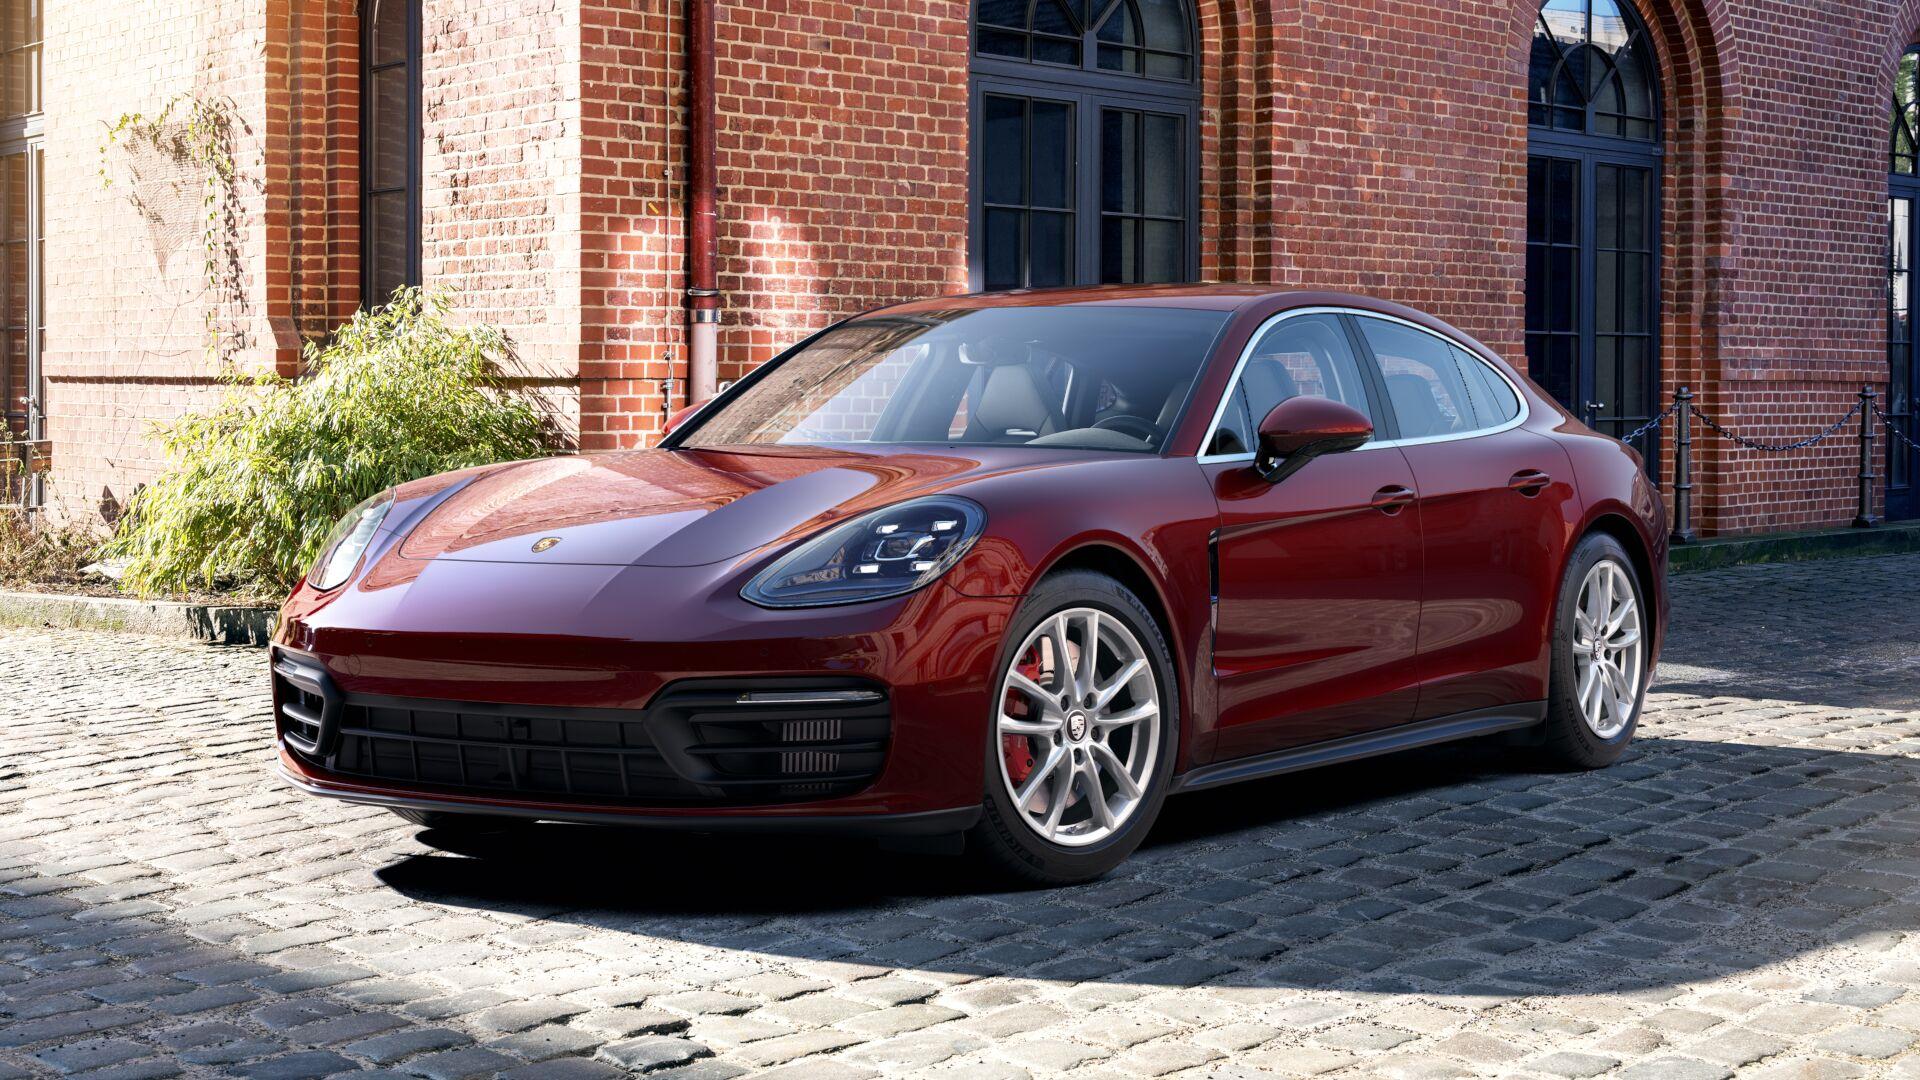 Porsche - Panamera 4S -